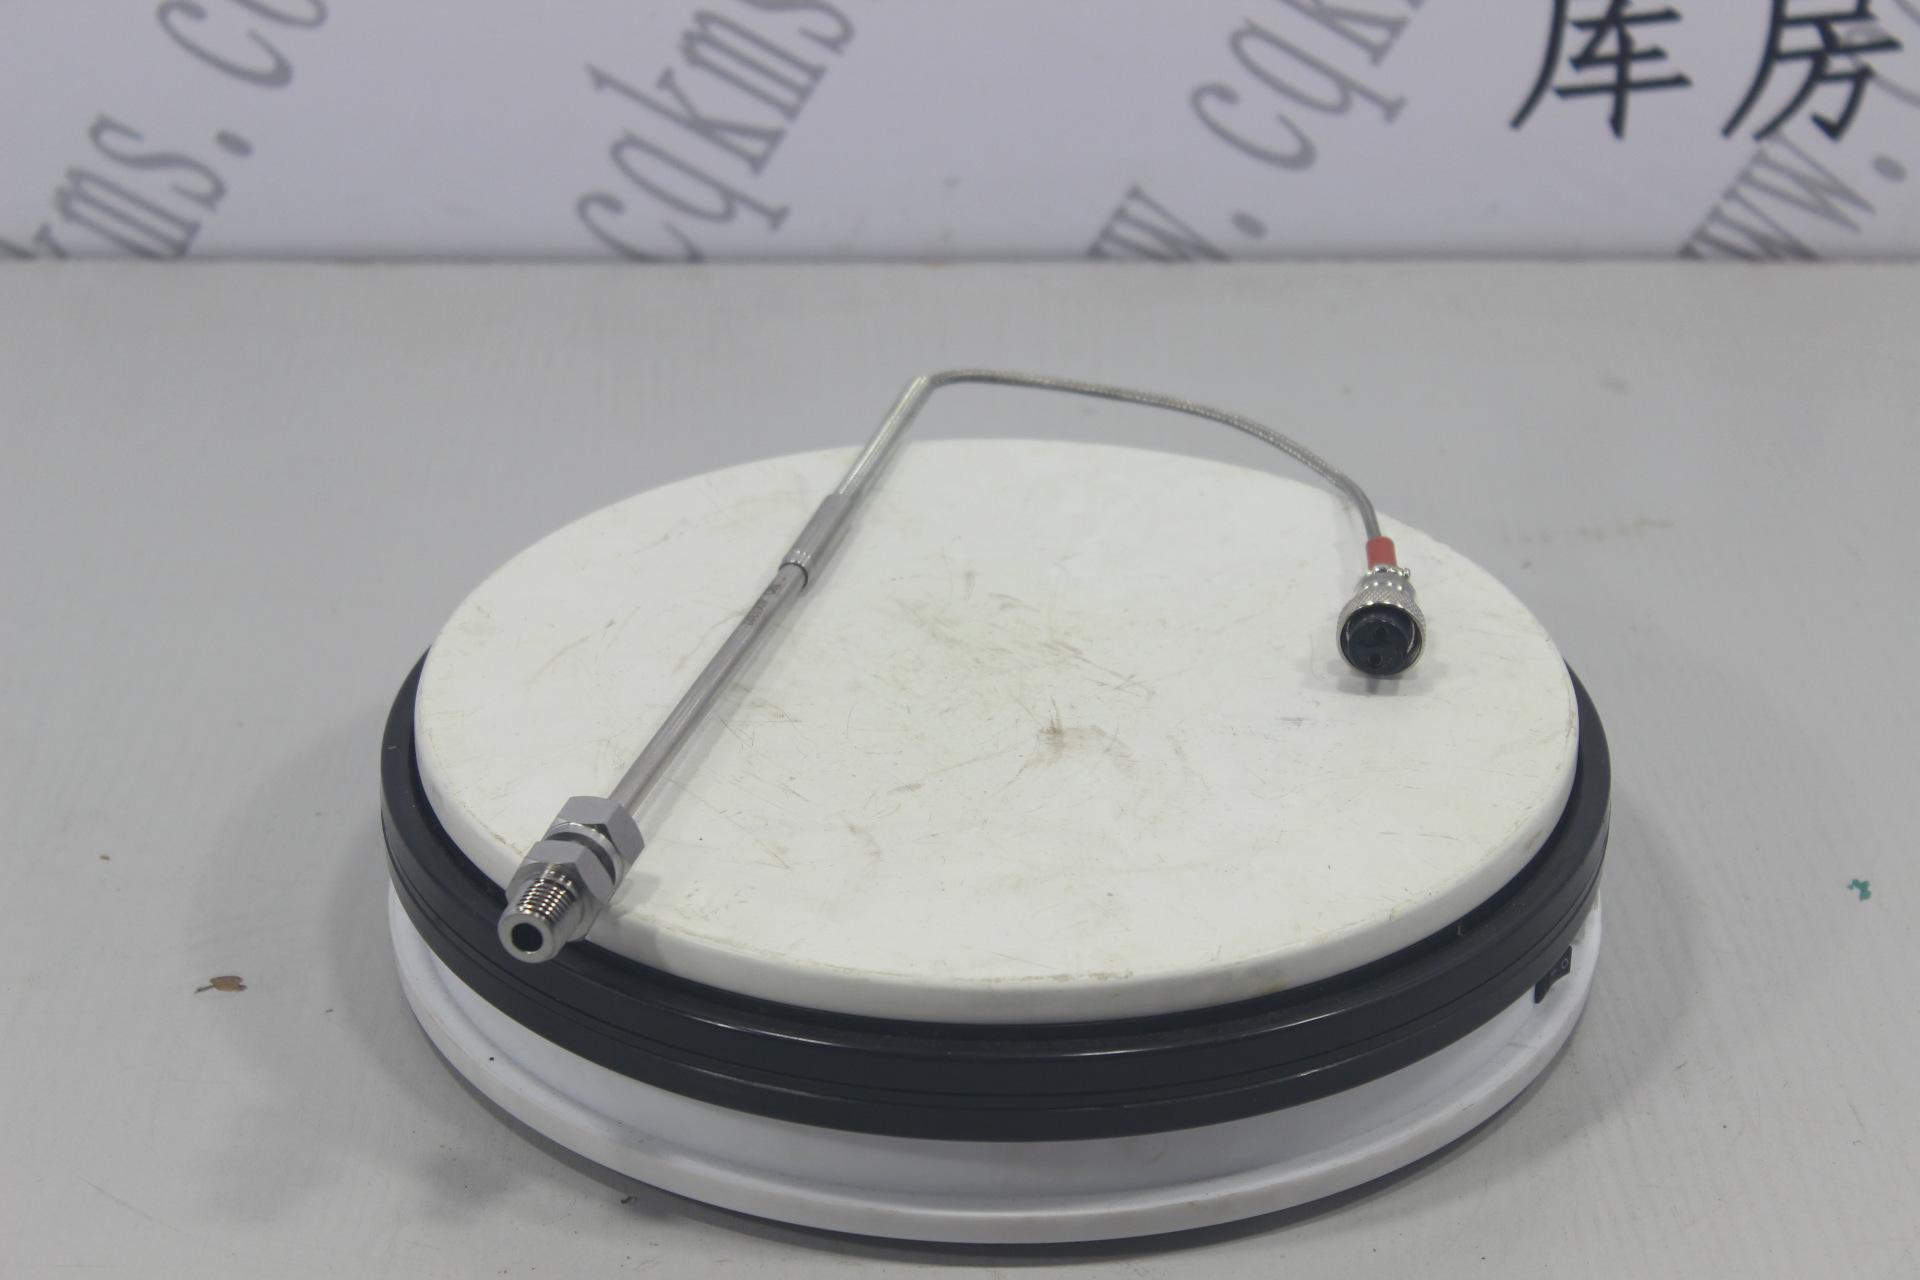 kms02144-4061392-热电偶---参考规格总长47cm,配套接头长4.3cm,内径0.6cm-参考重量0.055Kg-0.055Kg图片1